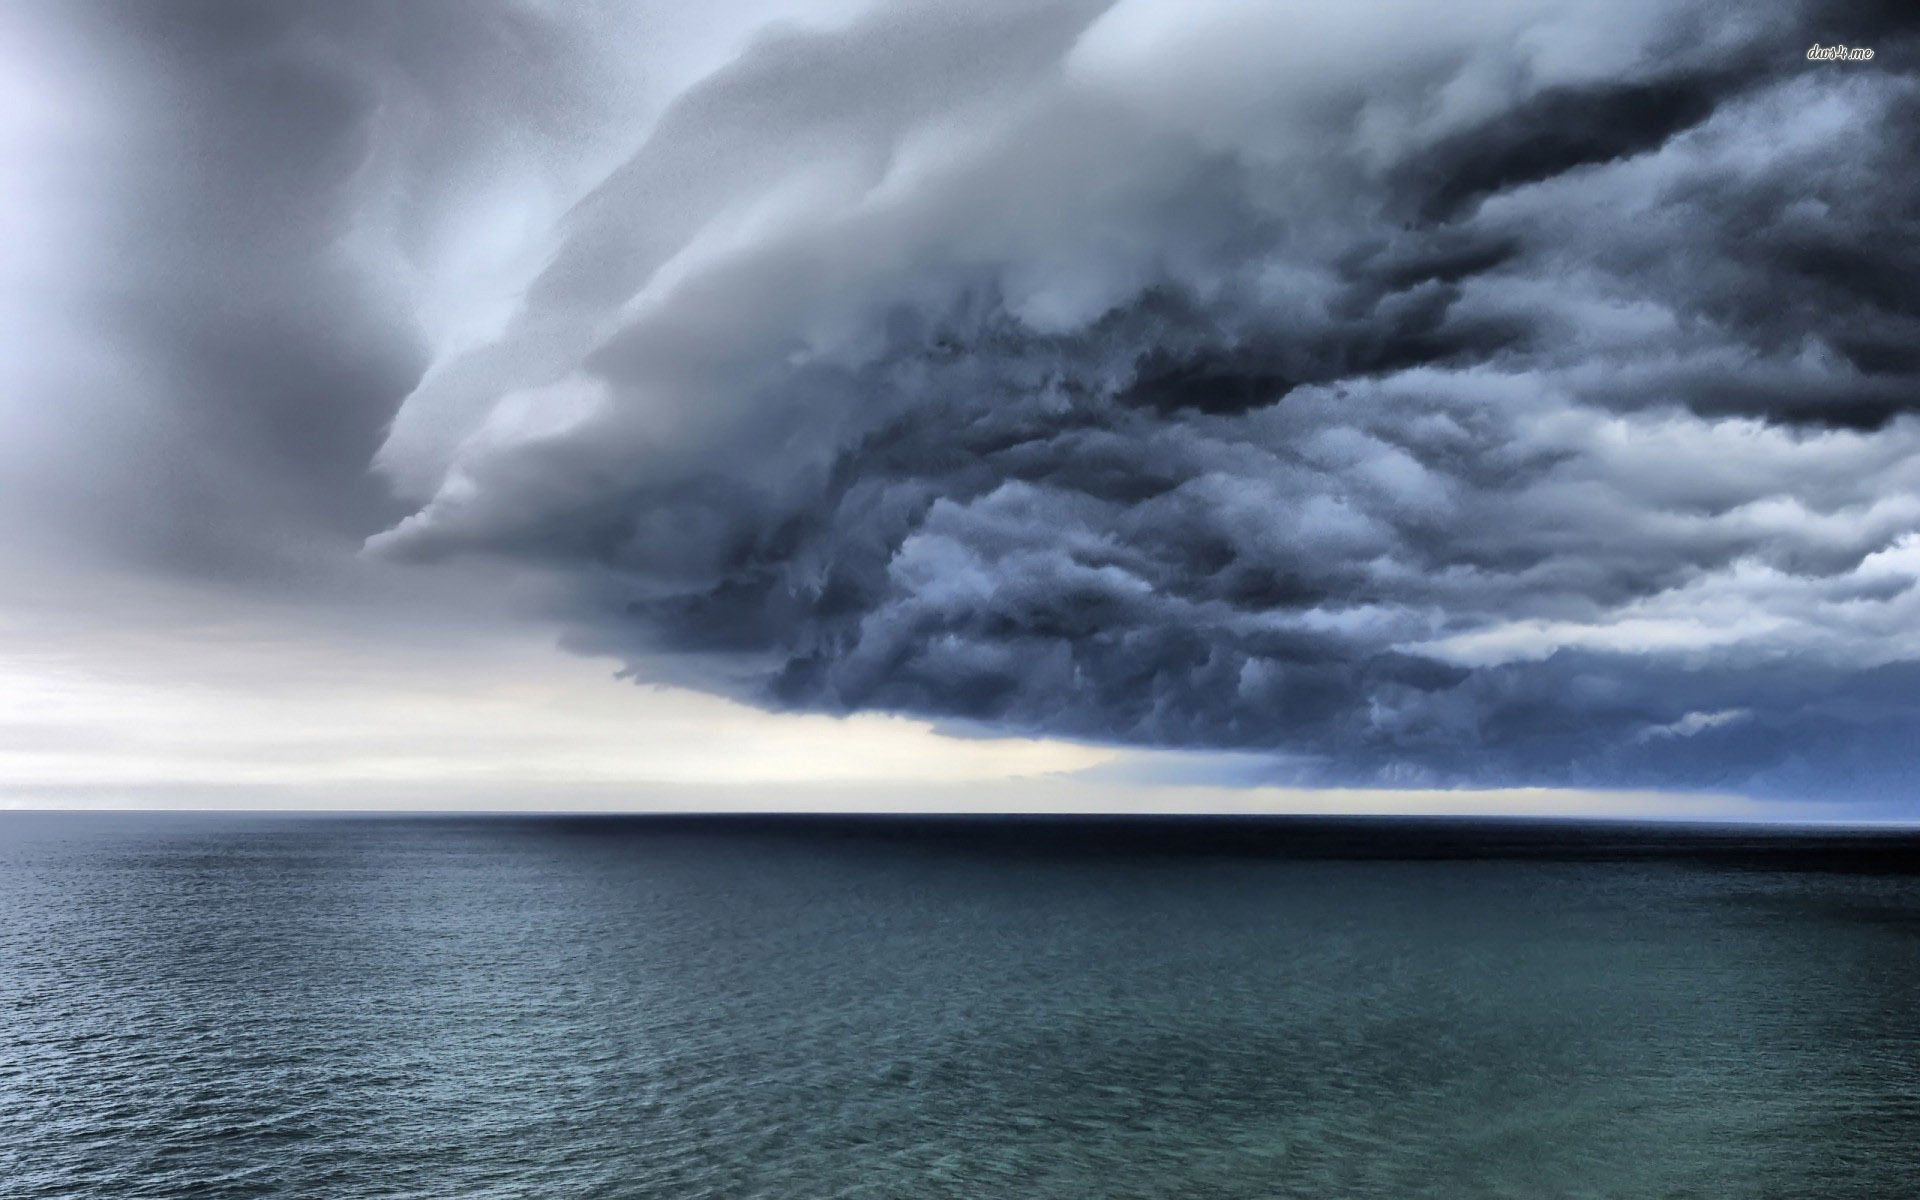 Beach Thunderstorm Wallpaper: Beach Wallpaper : Page 3 : Ellarow.com : Ocean Storm